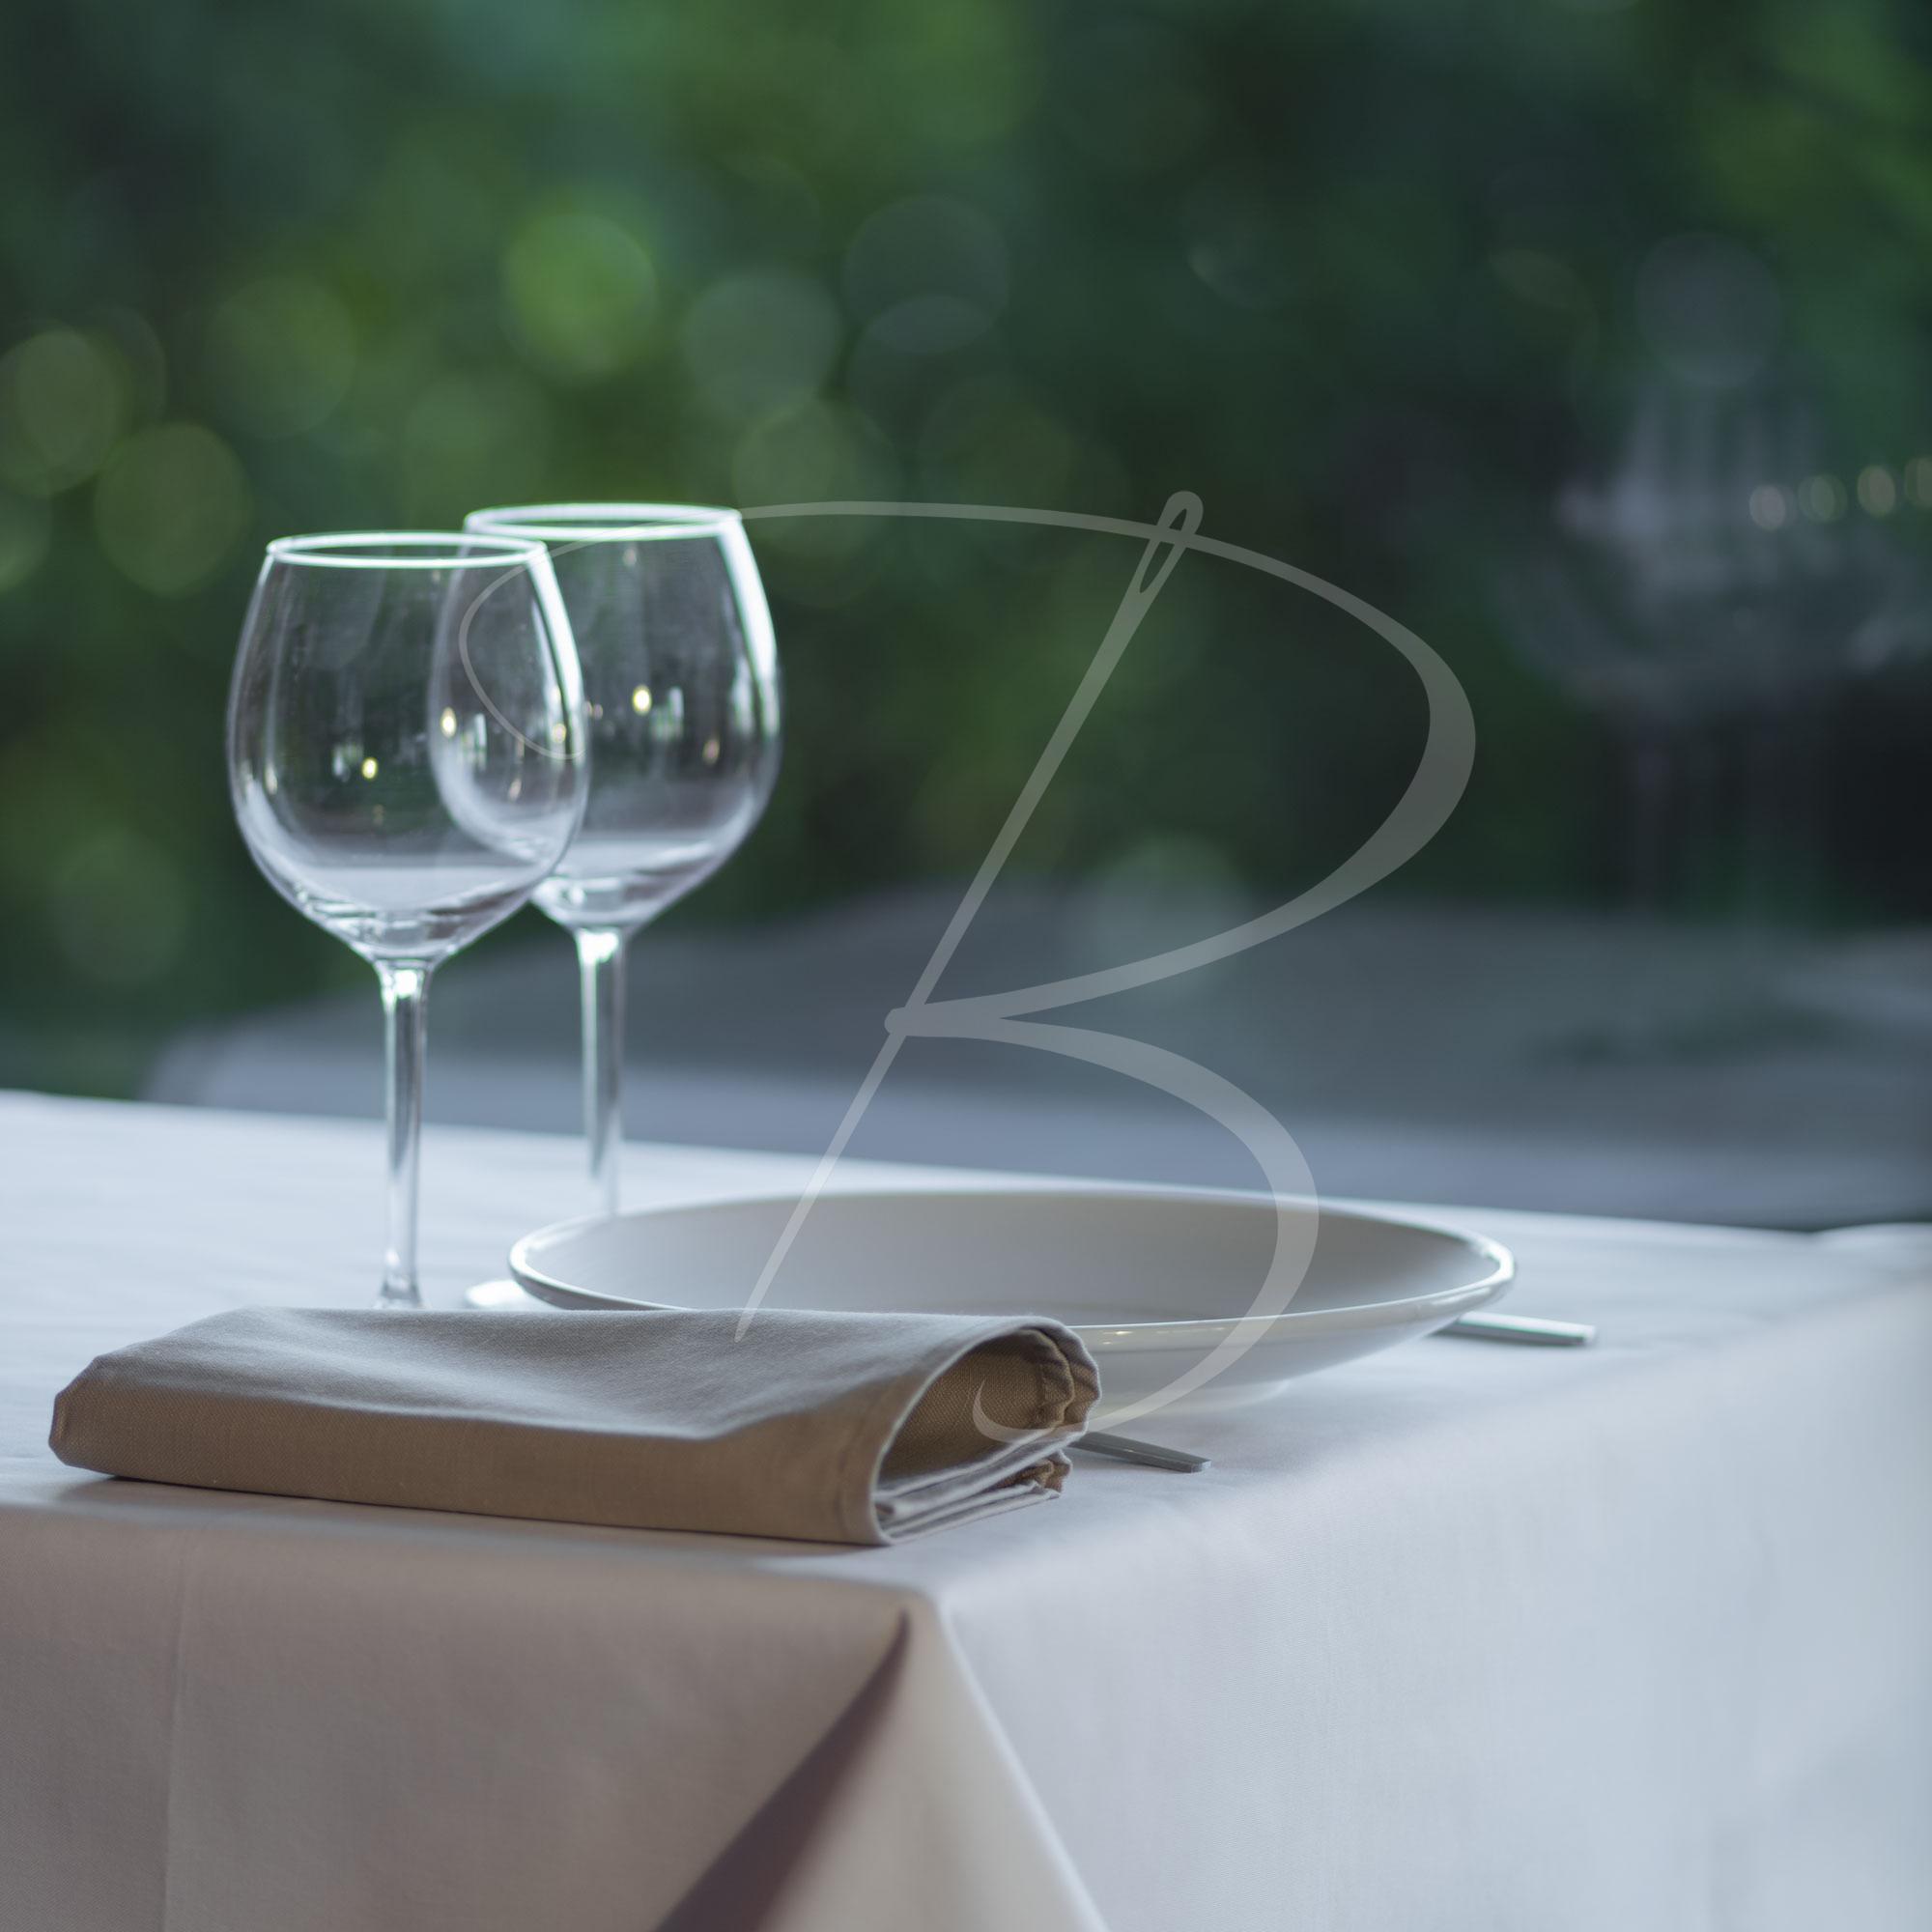 linge-table-cheverny-coton